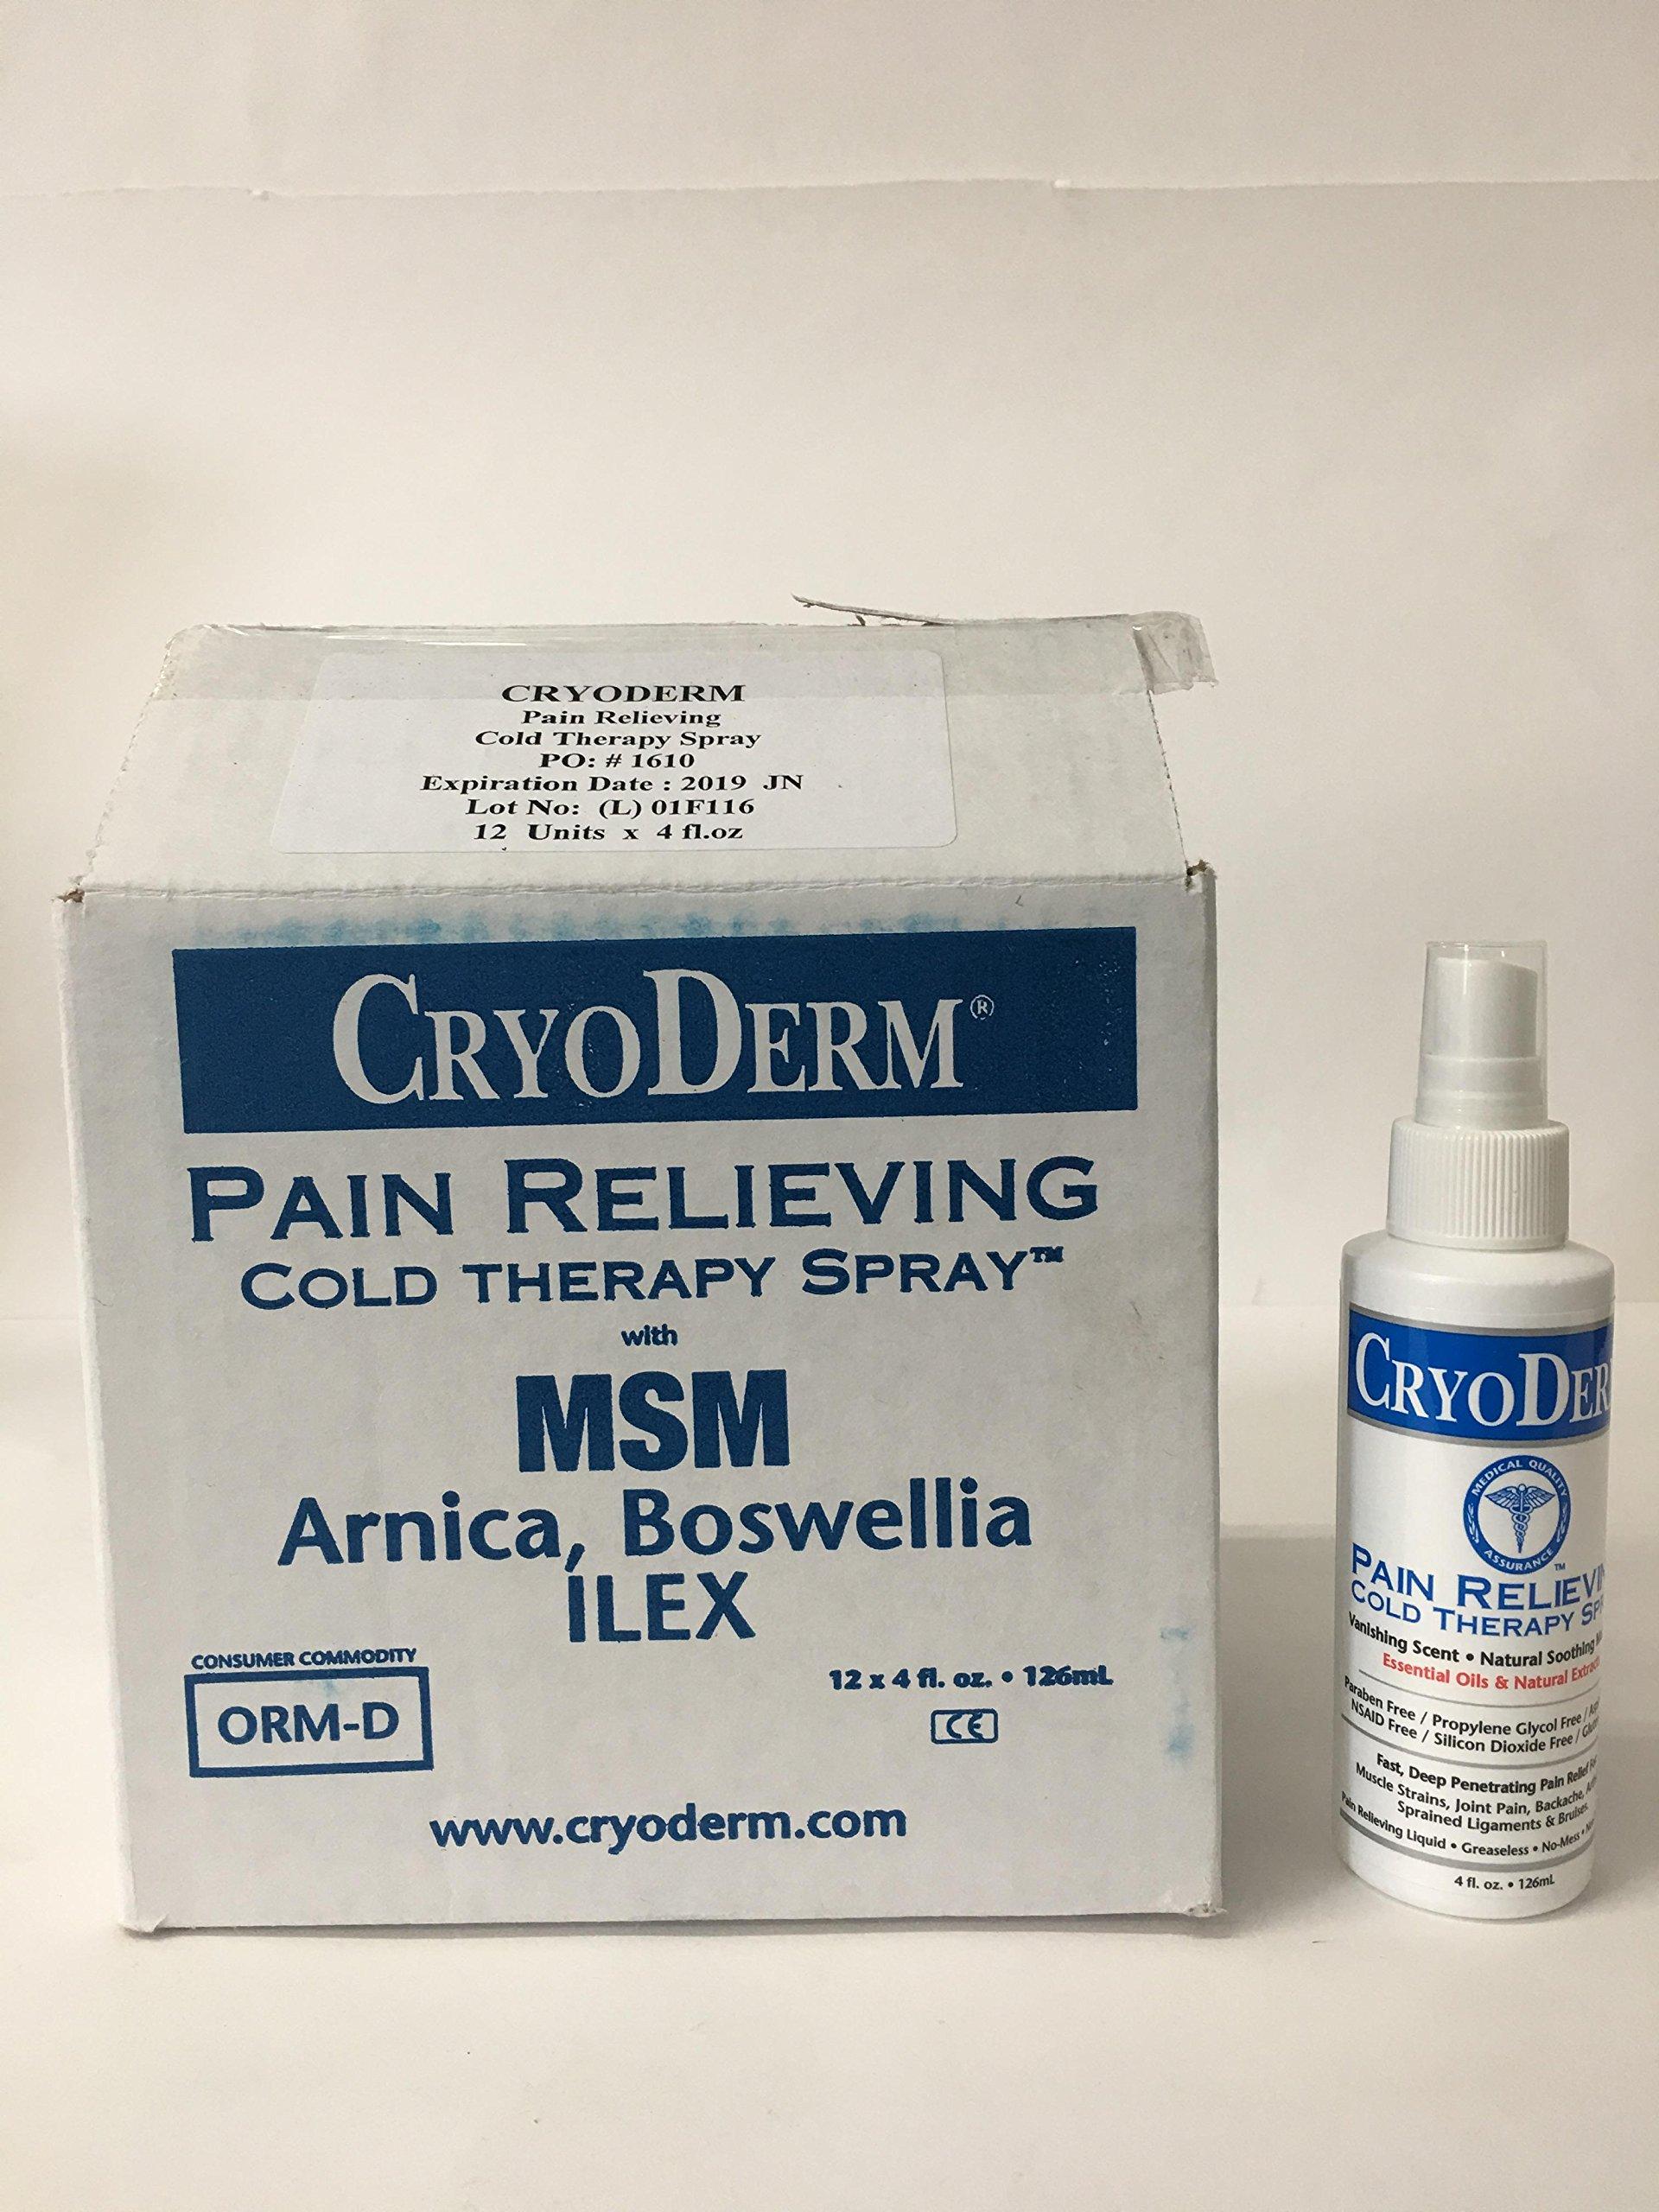 CryoDerm Pain Relief Spray (Case of 12) 4 oz each